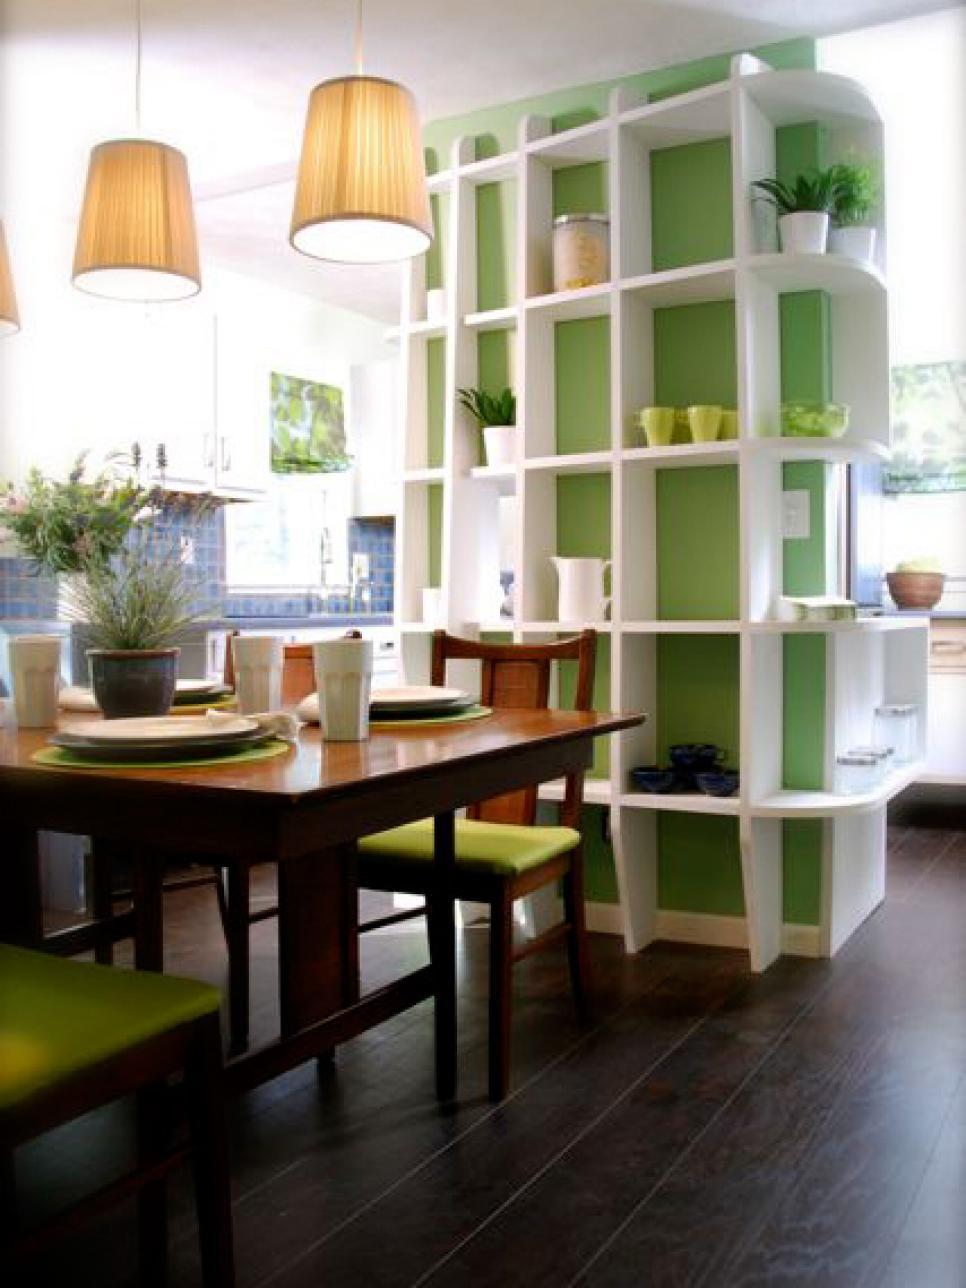 Stunning 10 Smart Design Ideas for Small Spaces | HGTV small home interior design